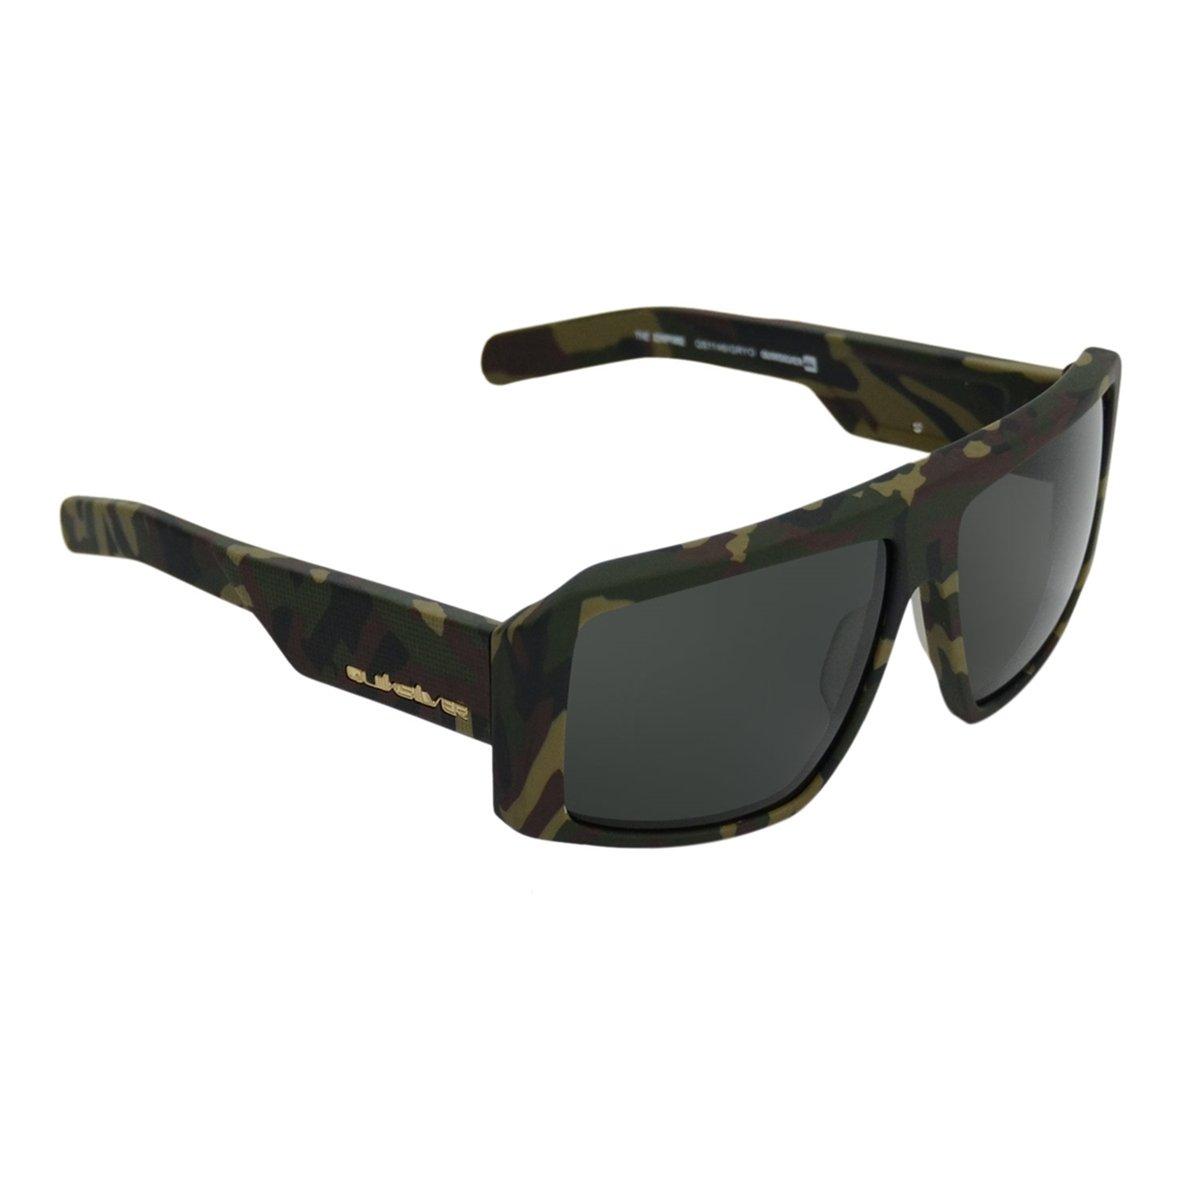 f2077eb7fa5c4 Óculos Quiksilver Empire Black Camo - Compre Agora